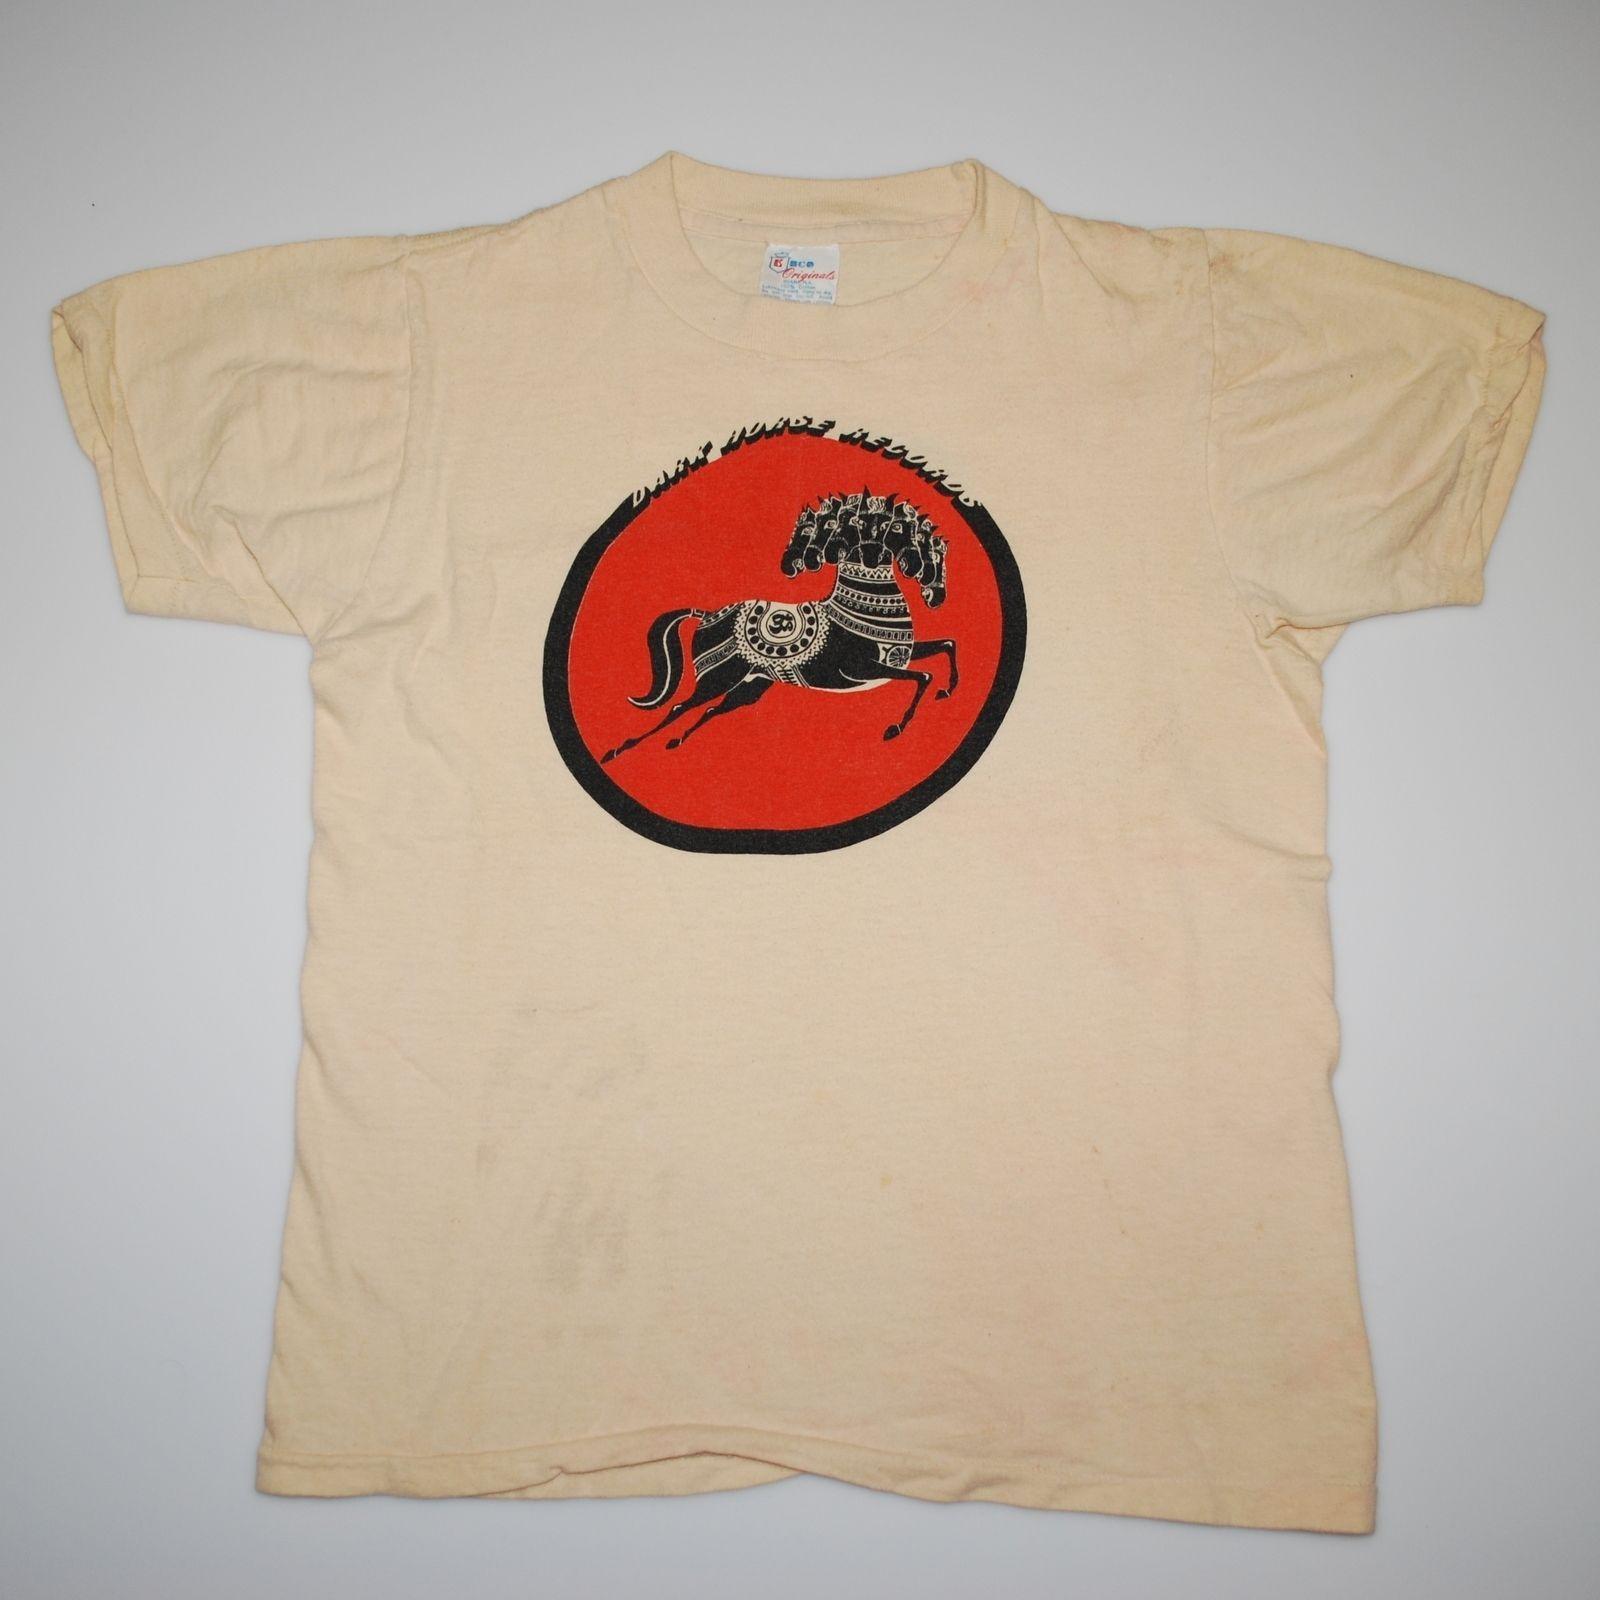 Original Vintage 1974 George Harrison Dark Horse Records A M Records Promo Shirt | eBay